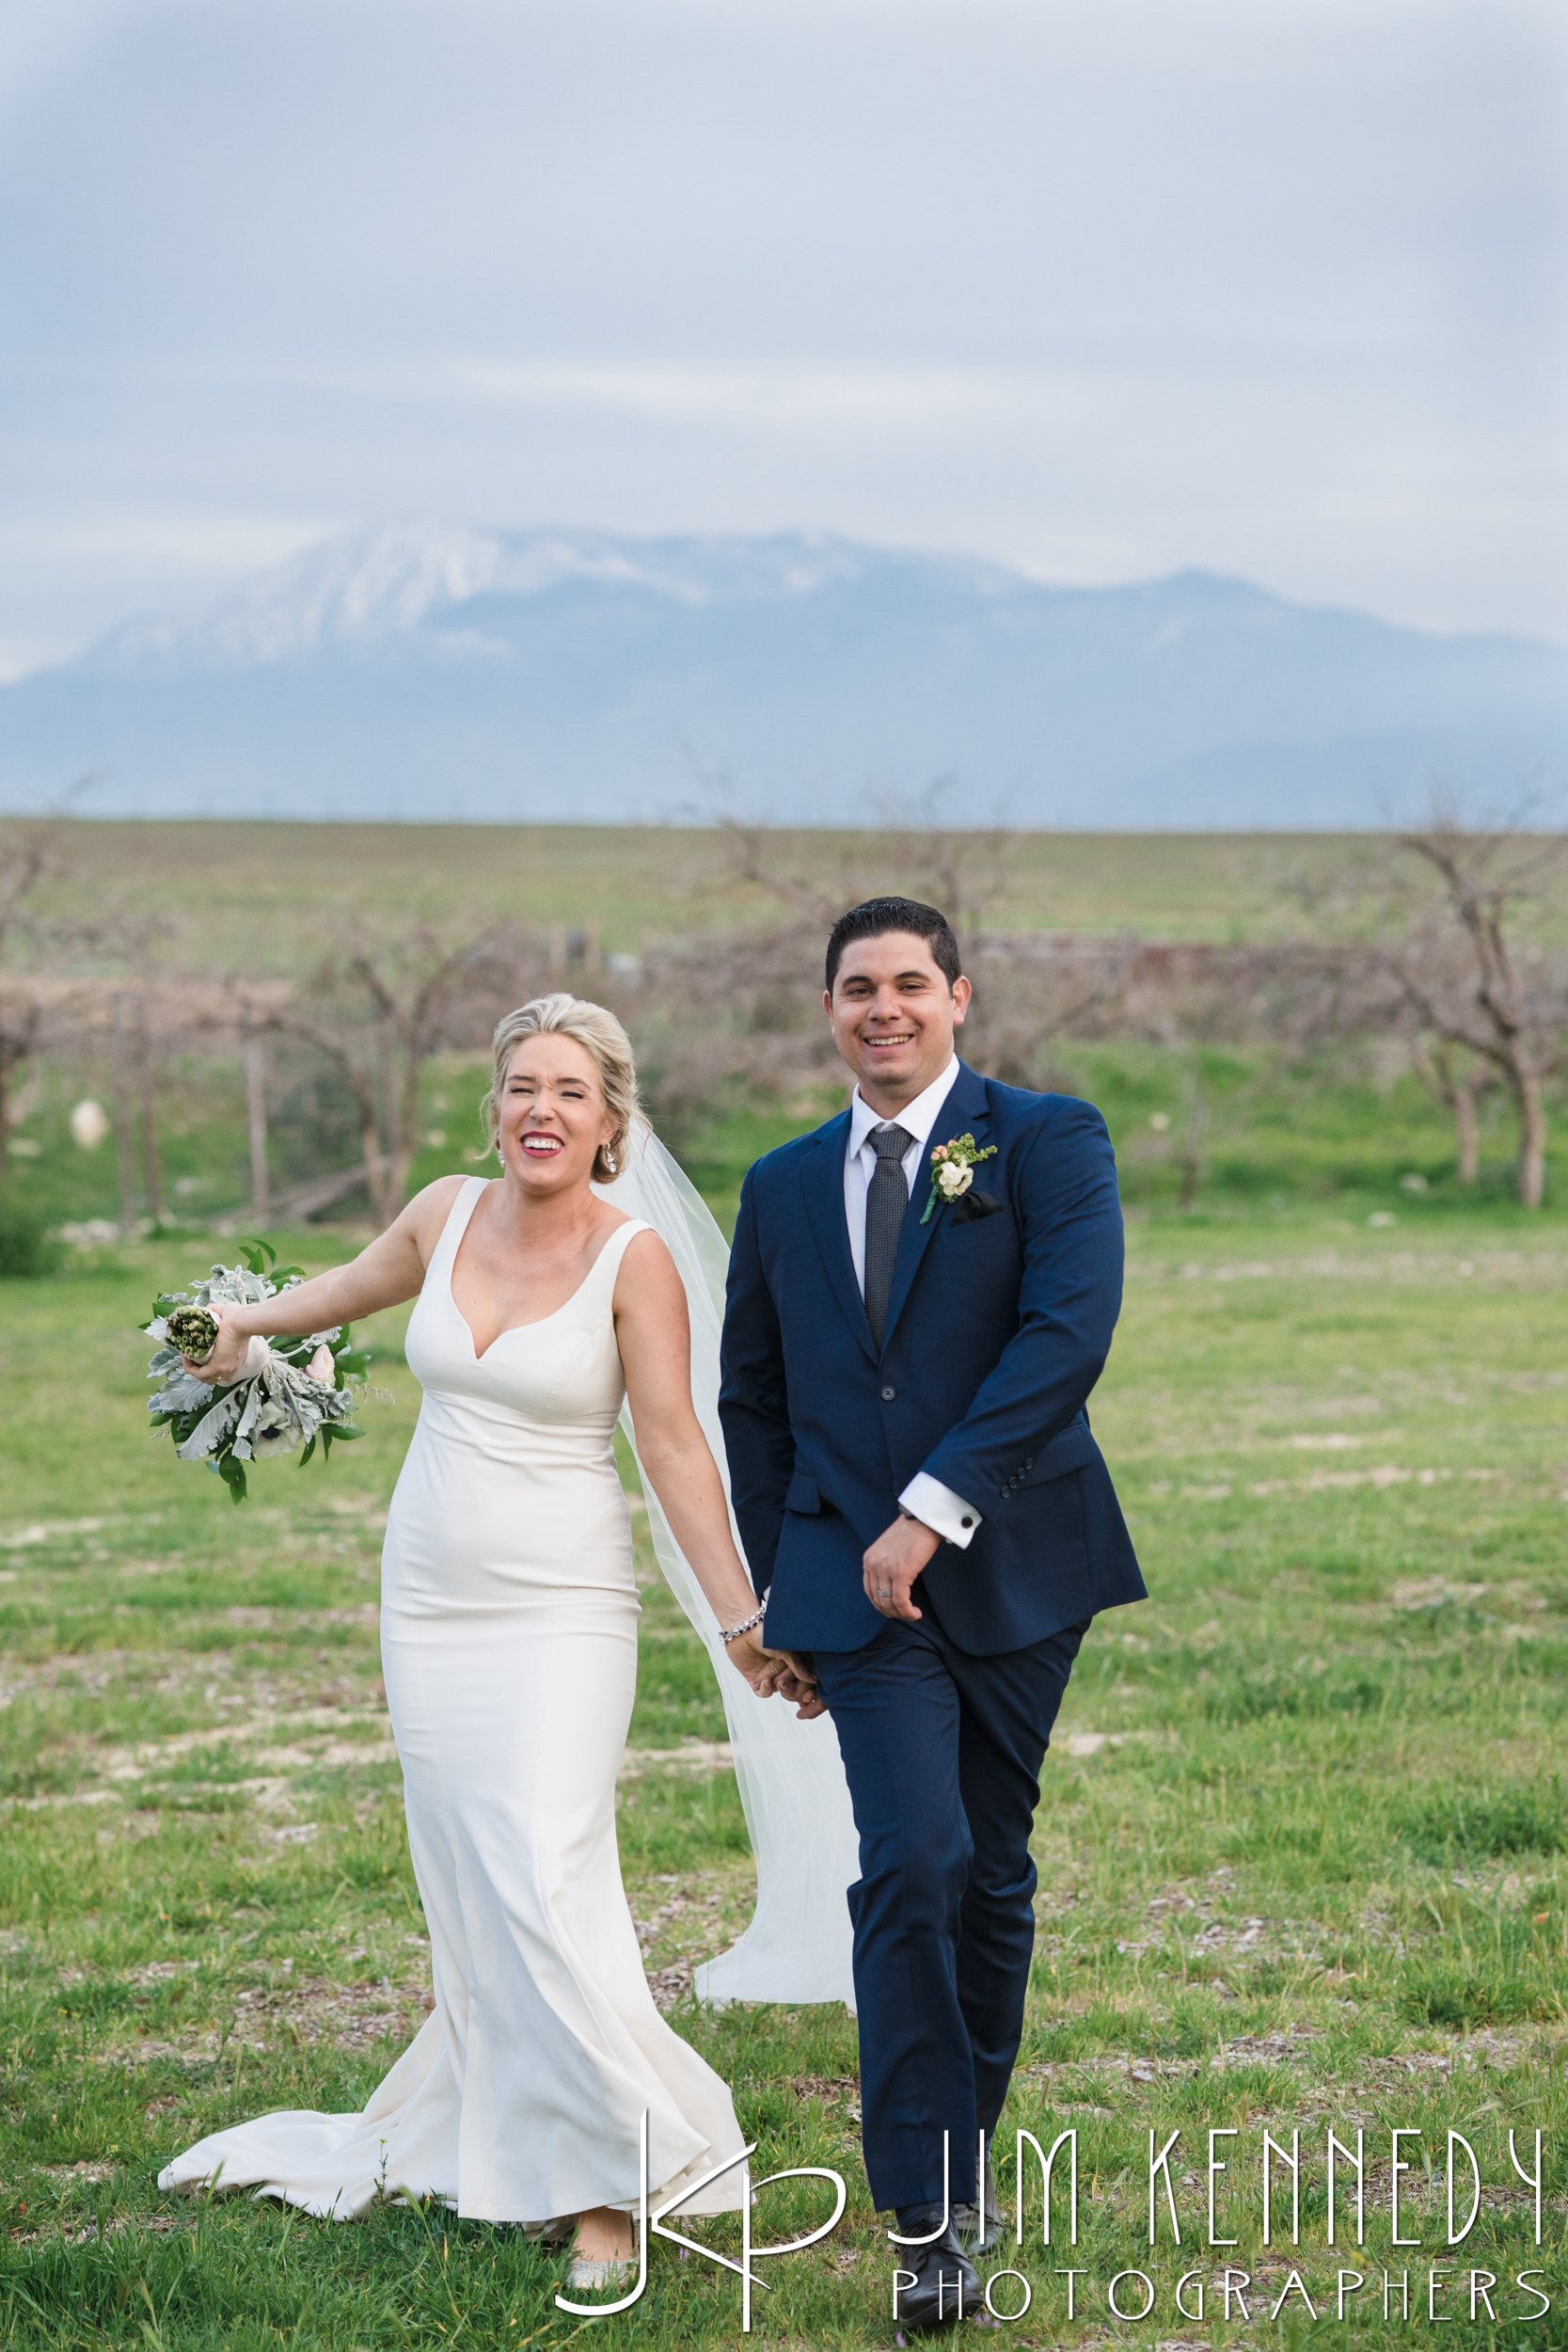 jim_kennedy_photographers_highland_springs_wedding_caitlyn_0146.jpg